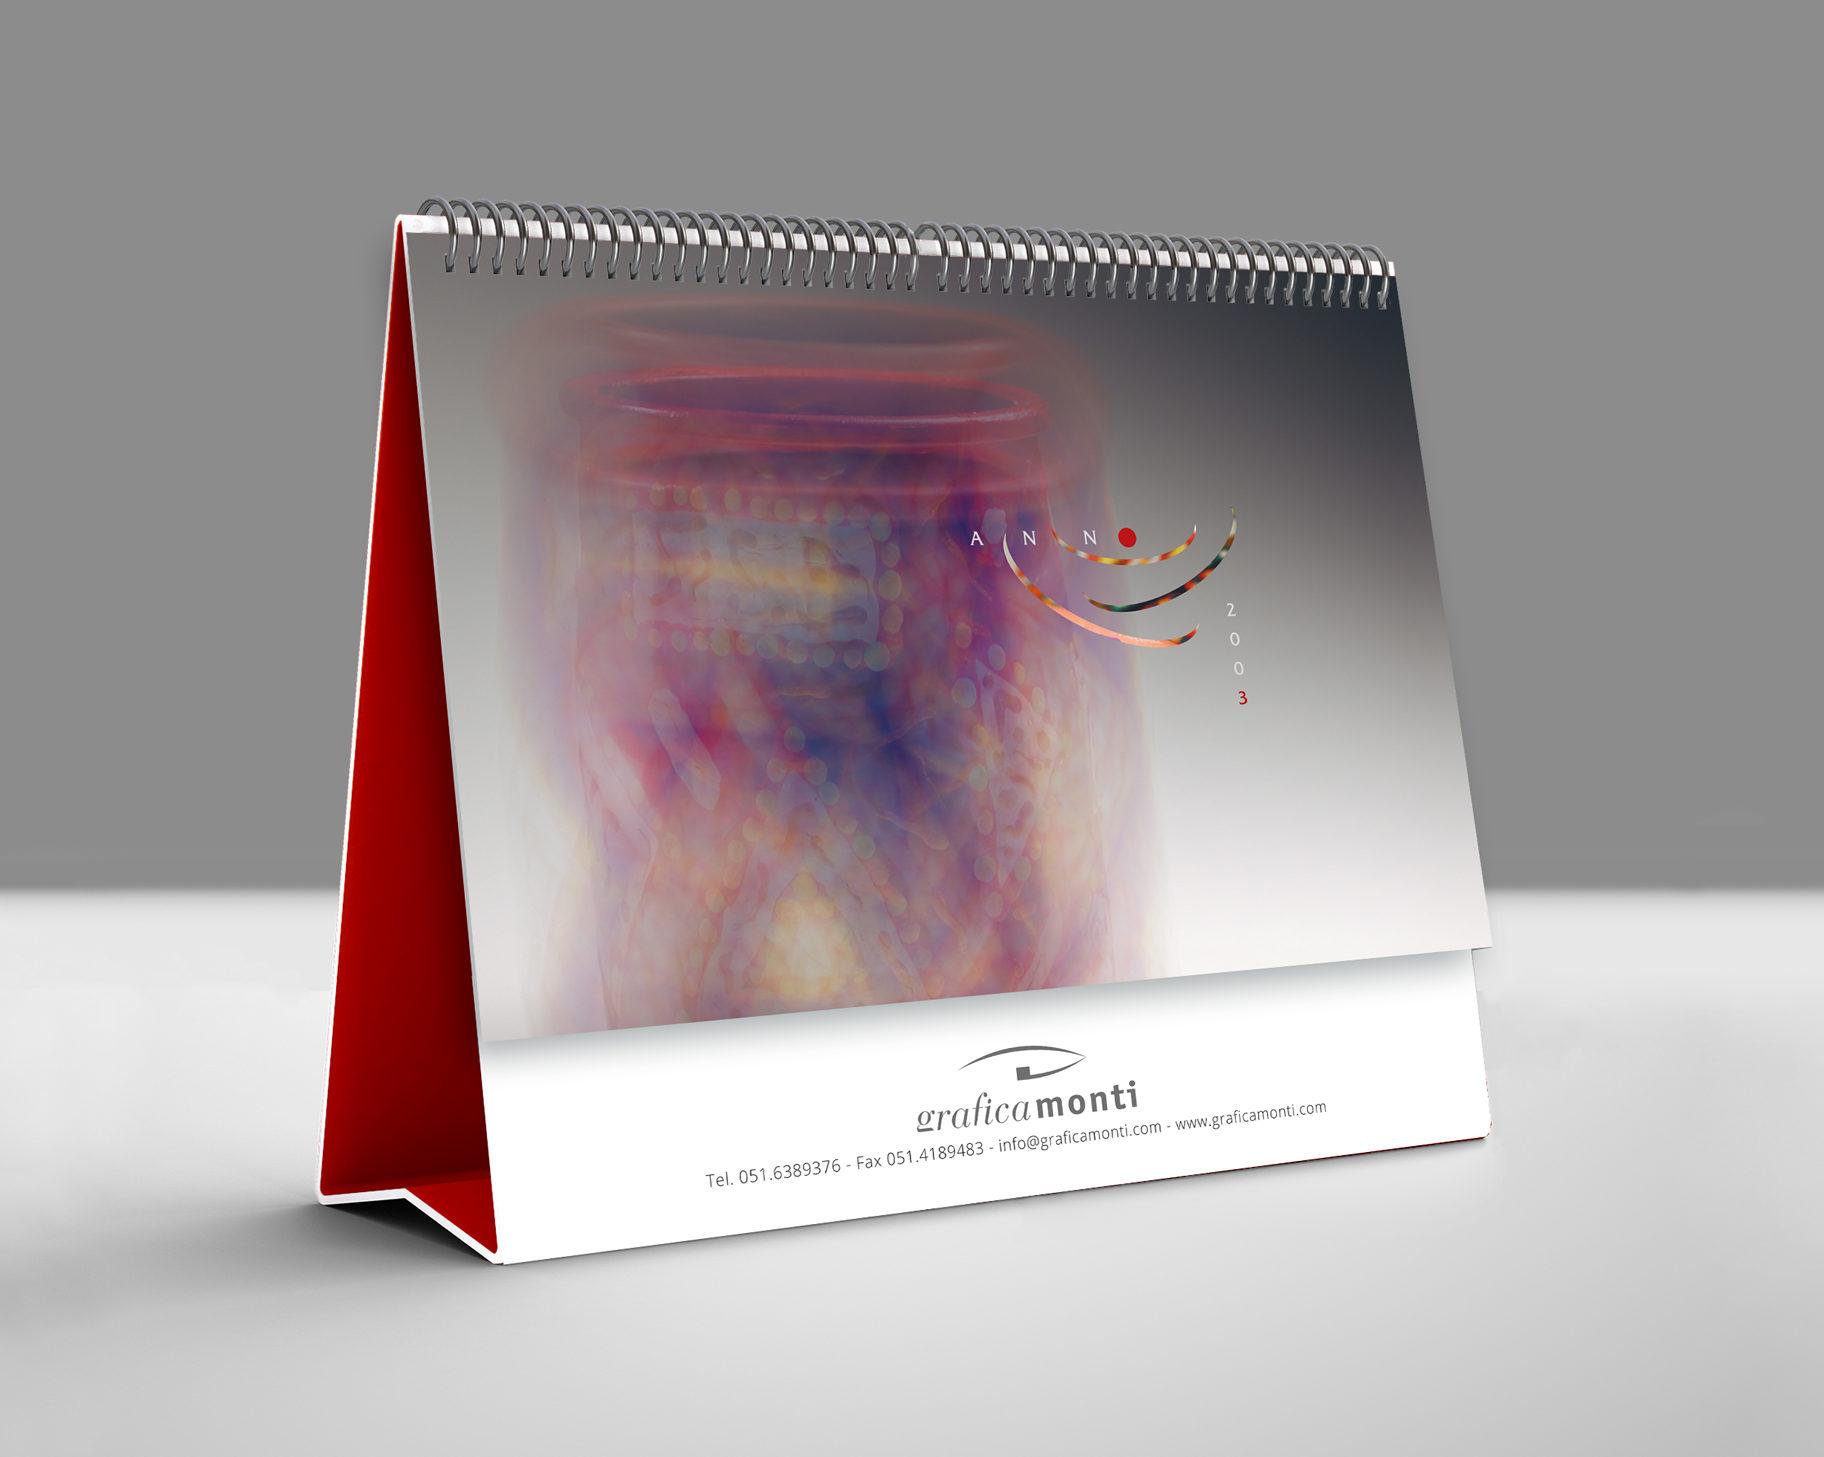 GraficaMonti-CalendarioMINI-2003